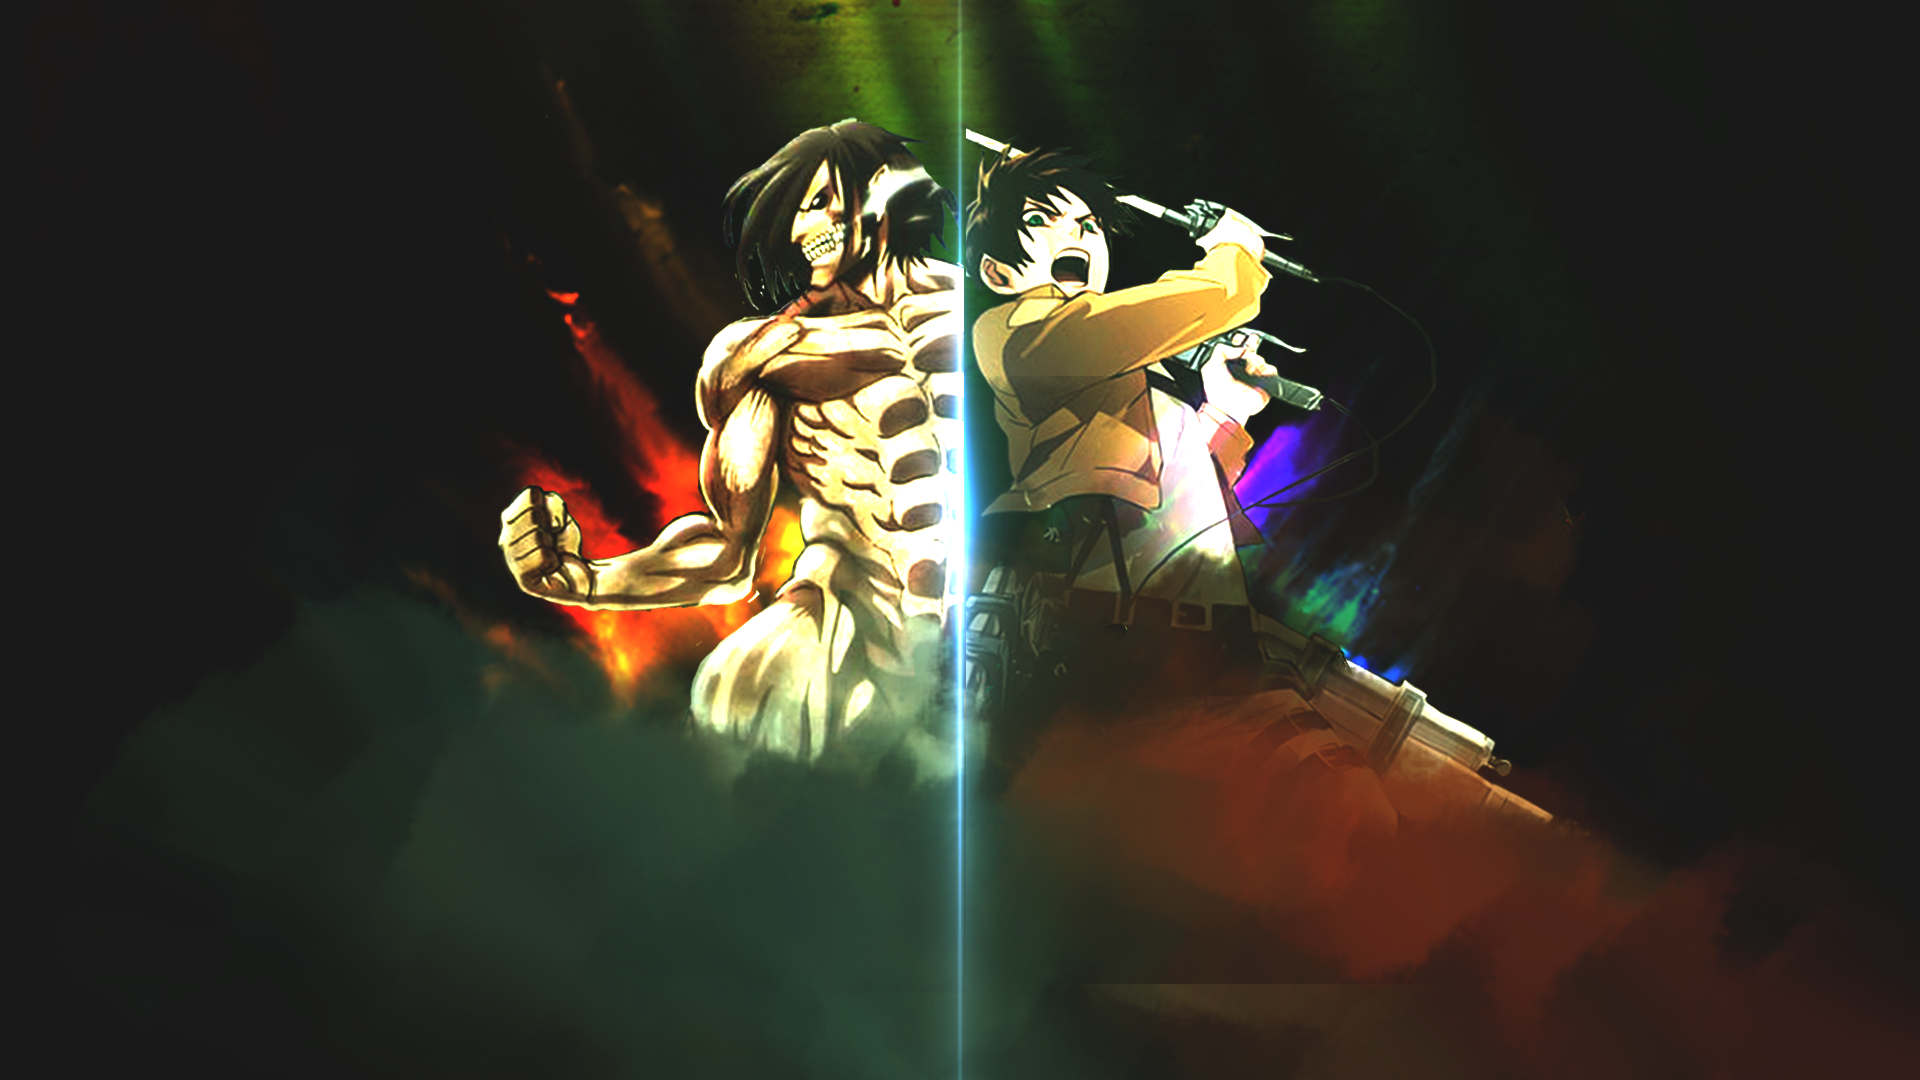 Attack On Titan Eren Jaeger Hd Wallpaper Background Image 1920x1080 Id 717079 Wallpaper Abyss